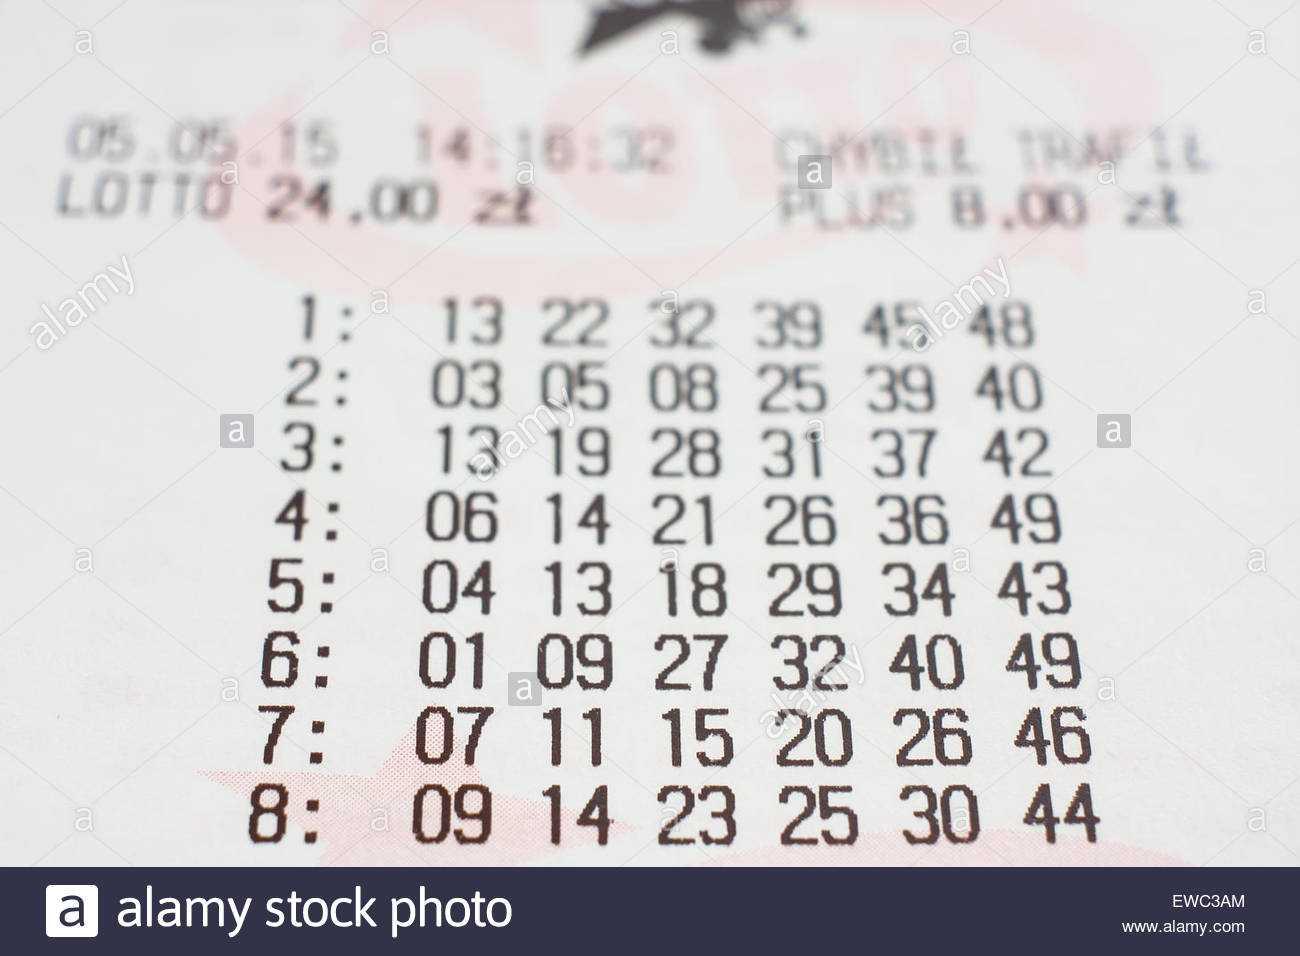 Polska loteria mini lotto